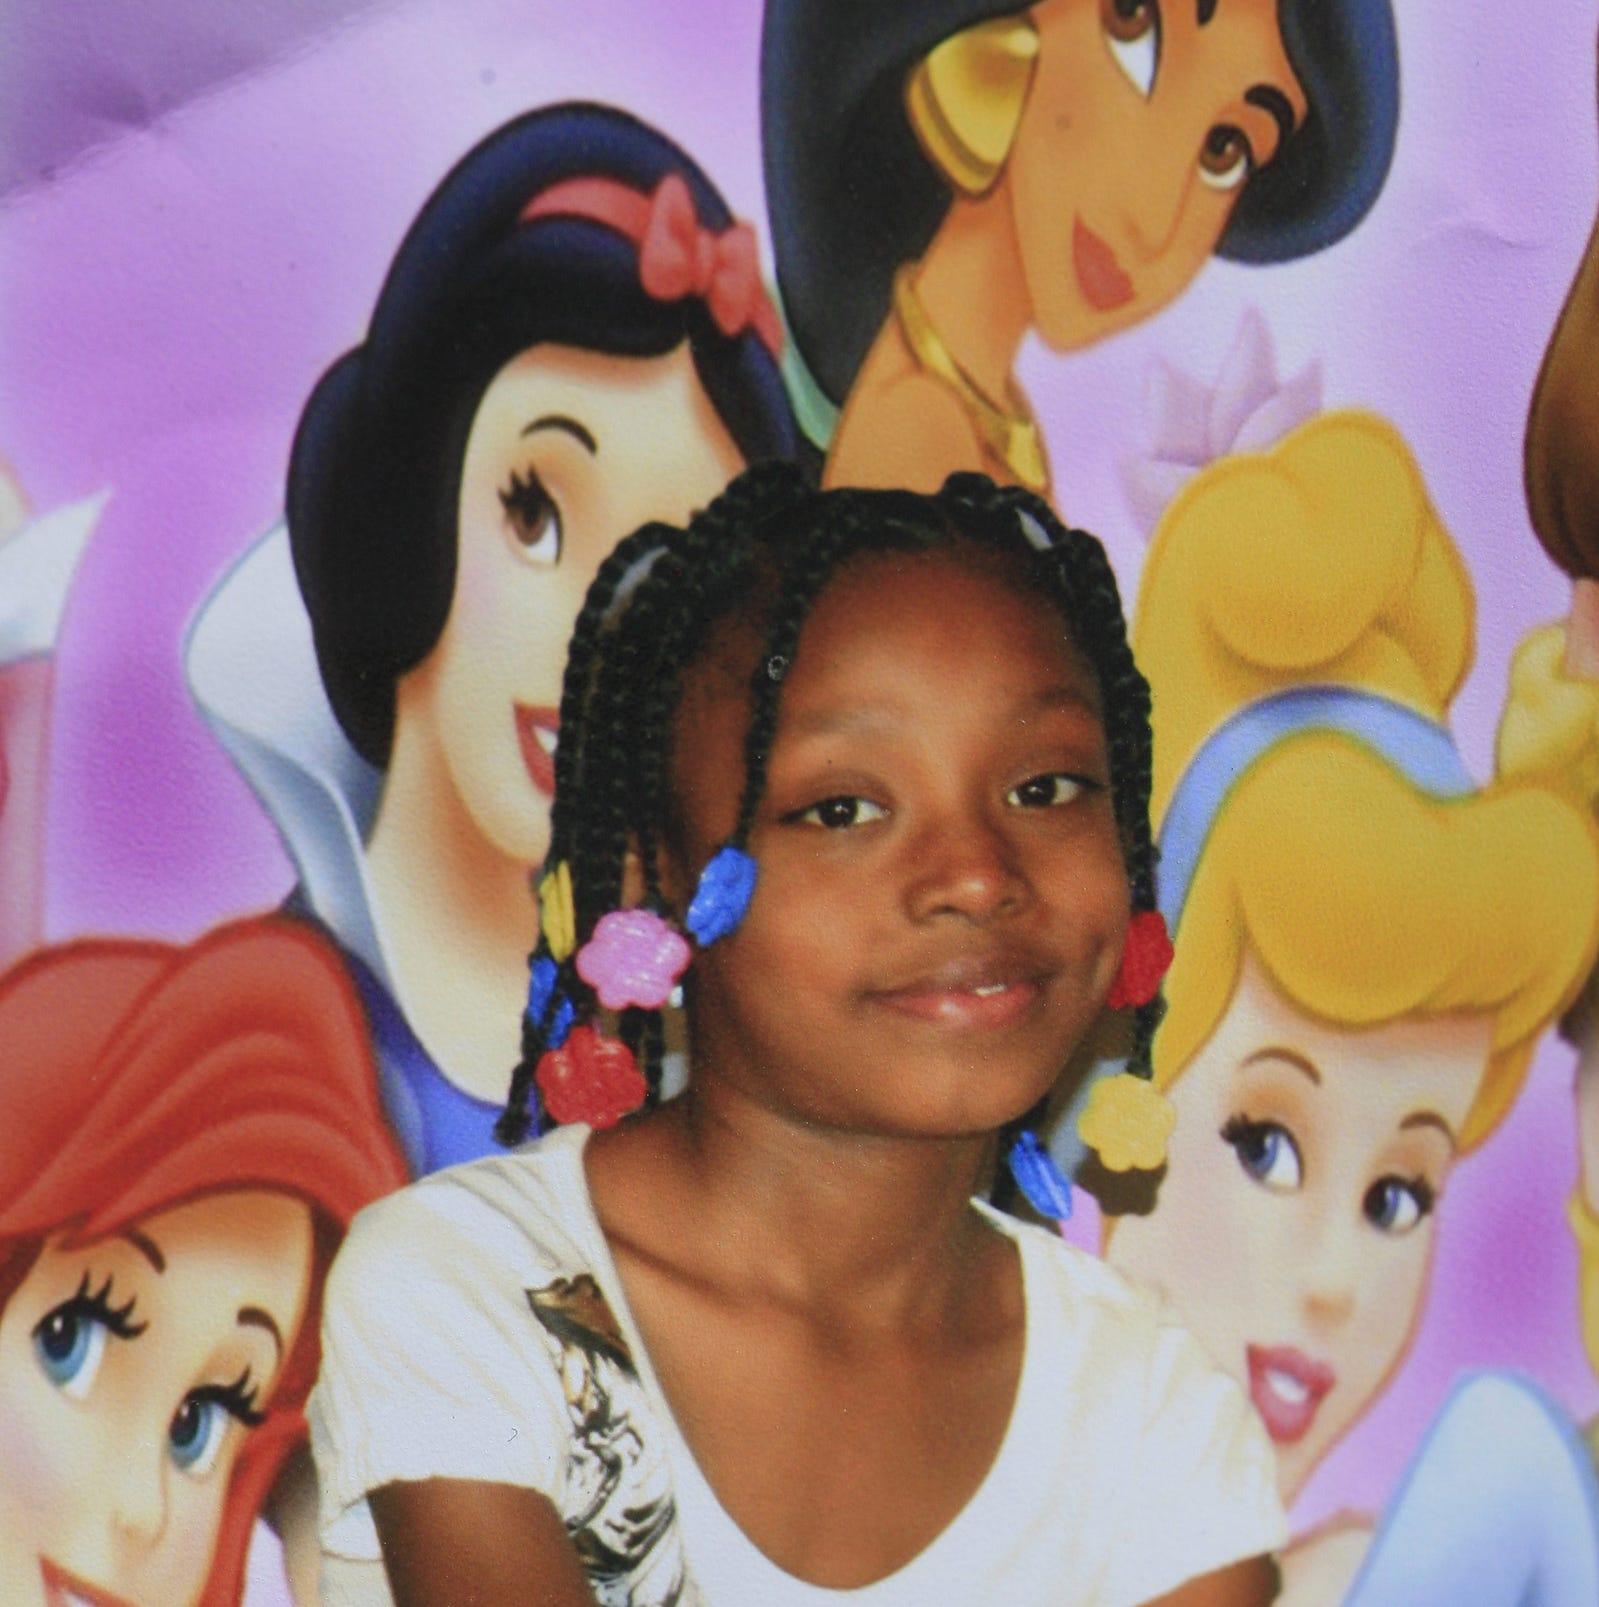 Detroit settles case of7-year-old girl shot during police raid for $8.25 million